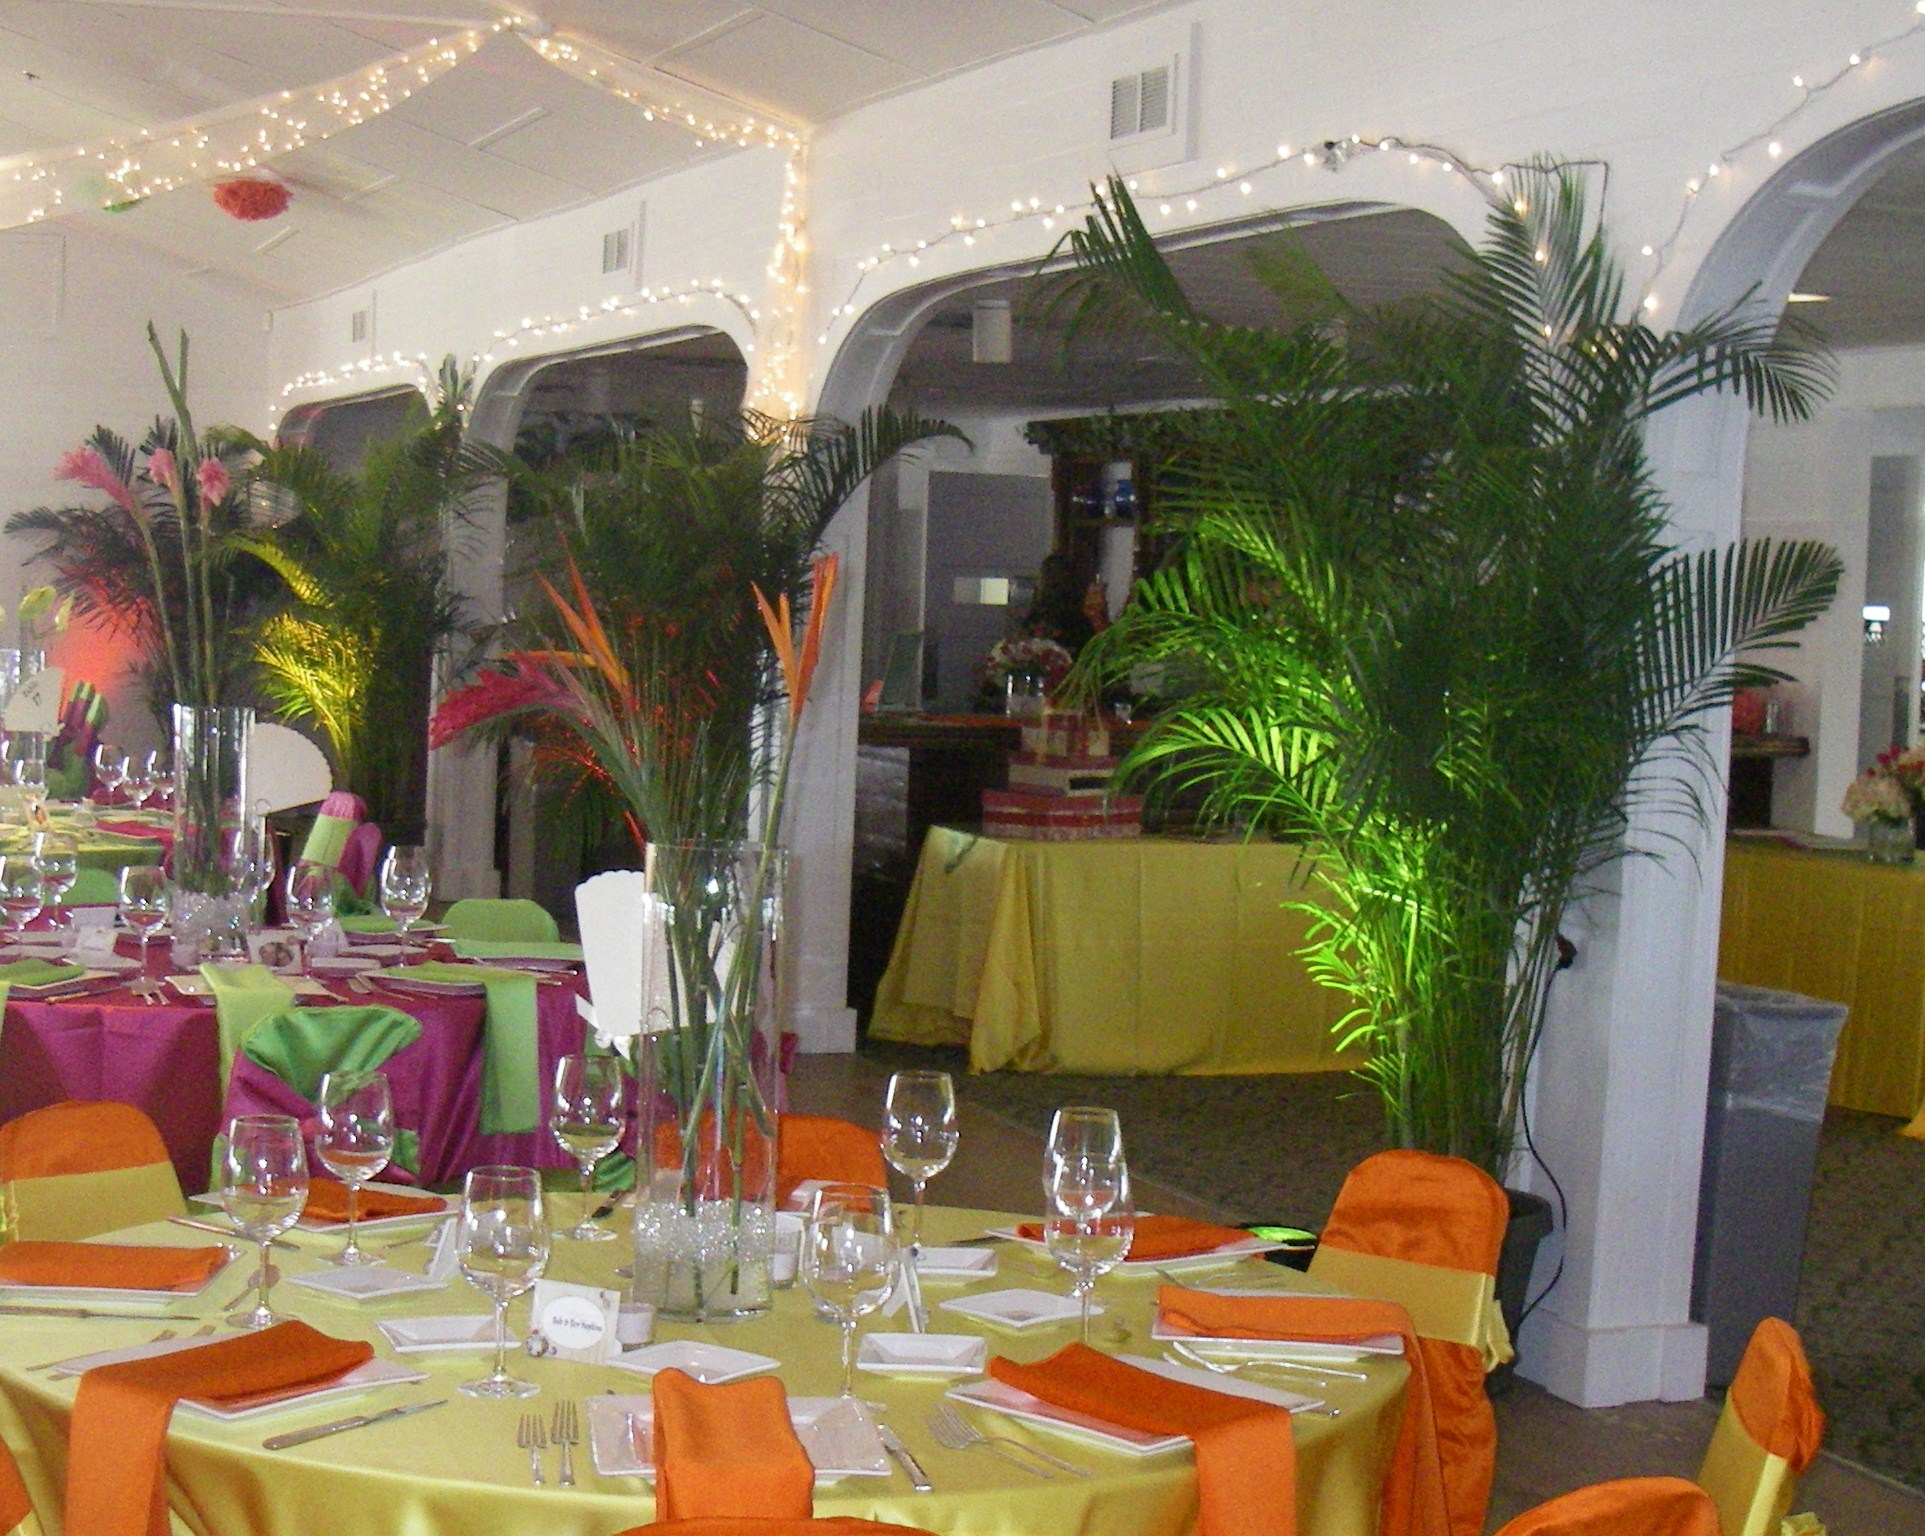 Gulfport casino ballroom 10